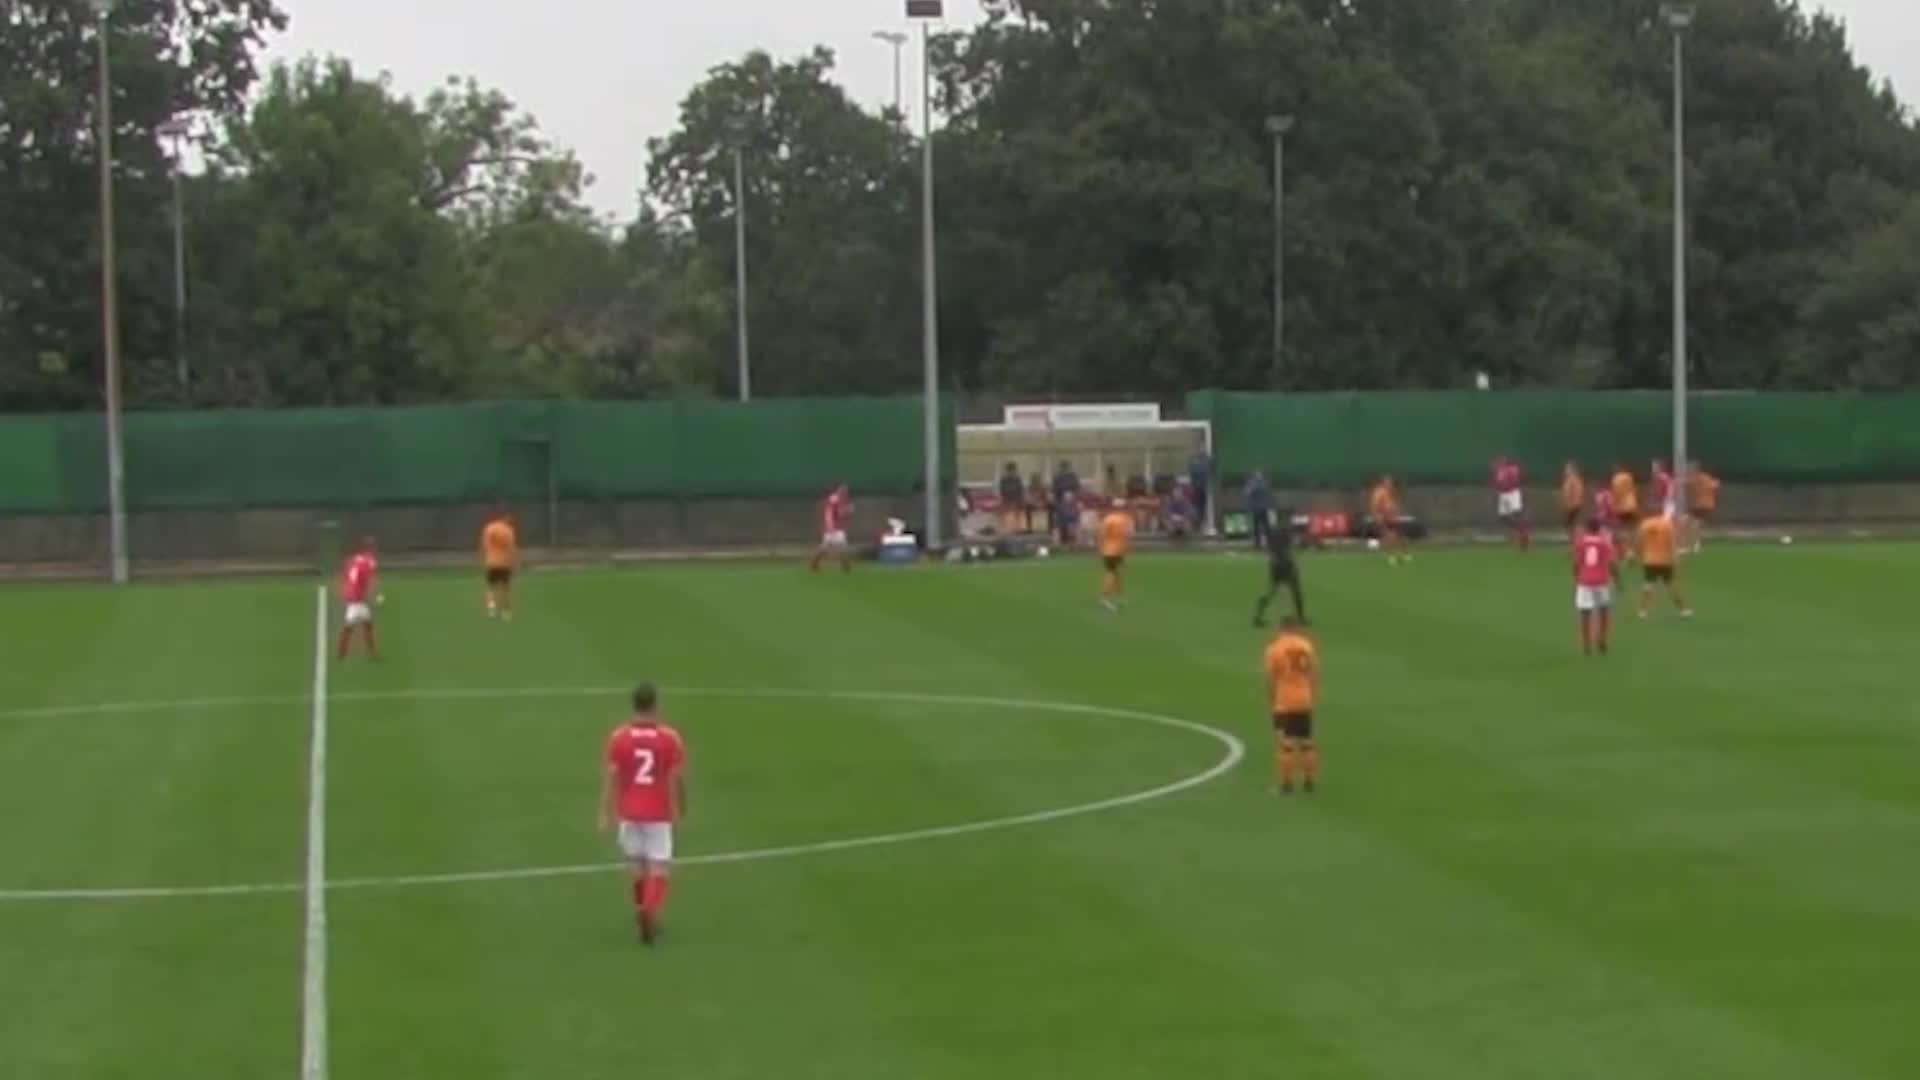 U18S HIGHLIGHTS | Charlton 5 Hull City 1 (September 2021)